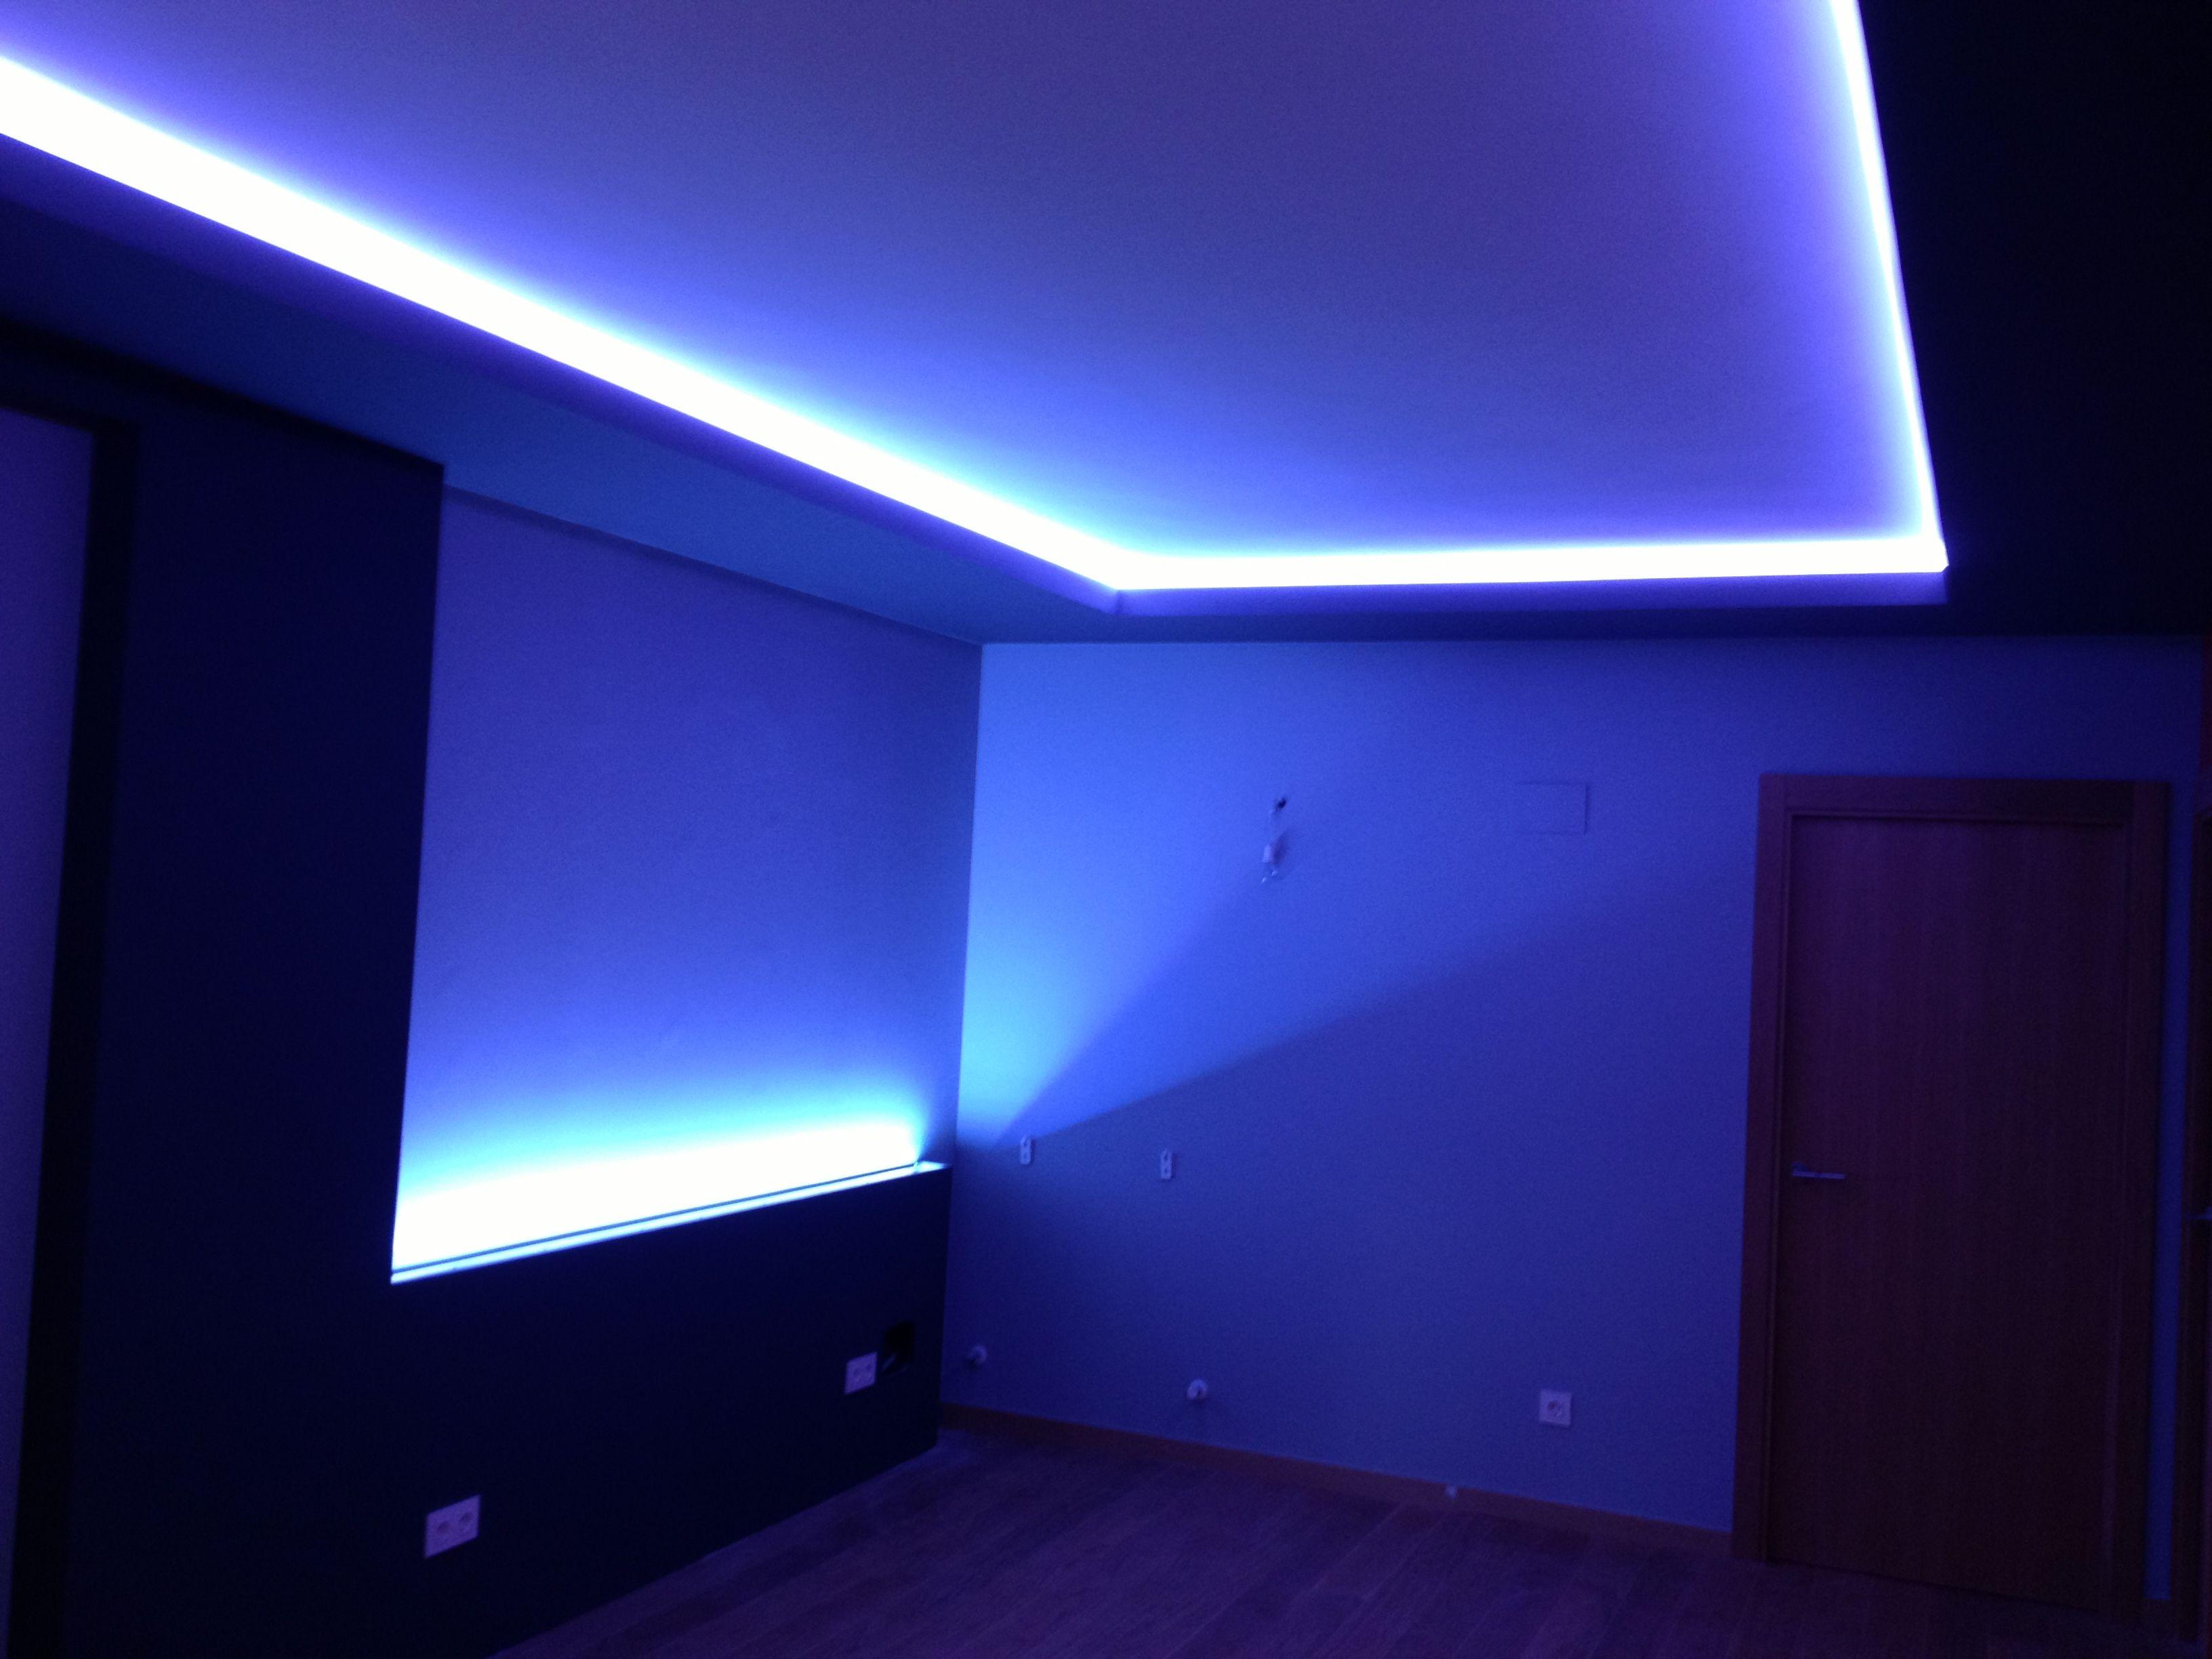 Tiras rgb en sal n 6 iluminacion en 2019 iluminaci n led y tiras de led - Iluminacion salon led ...